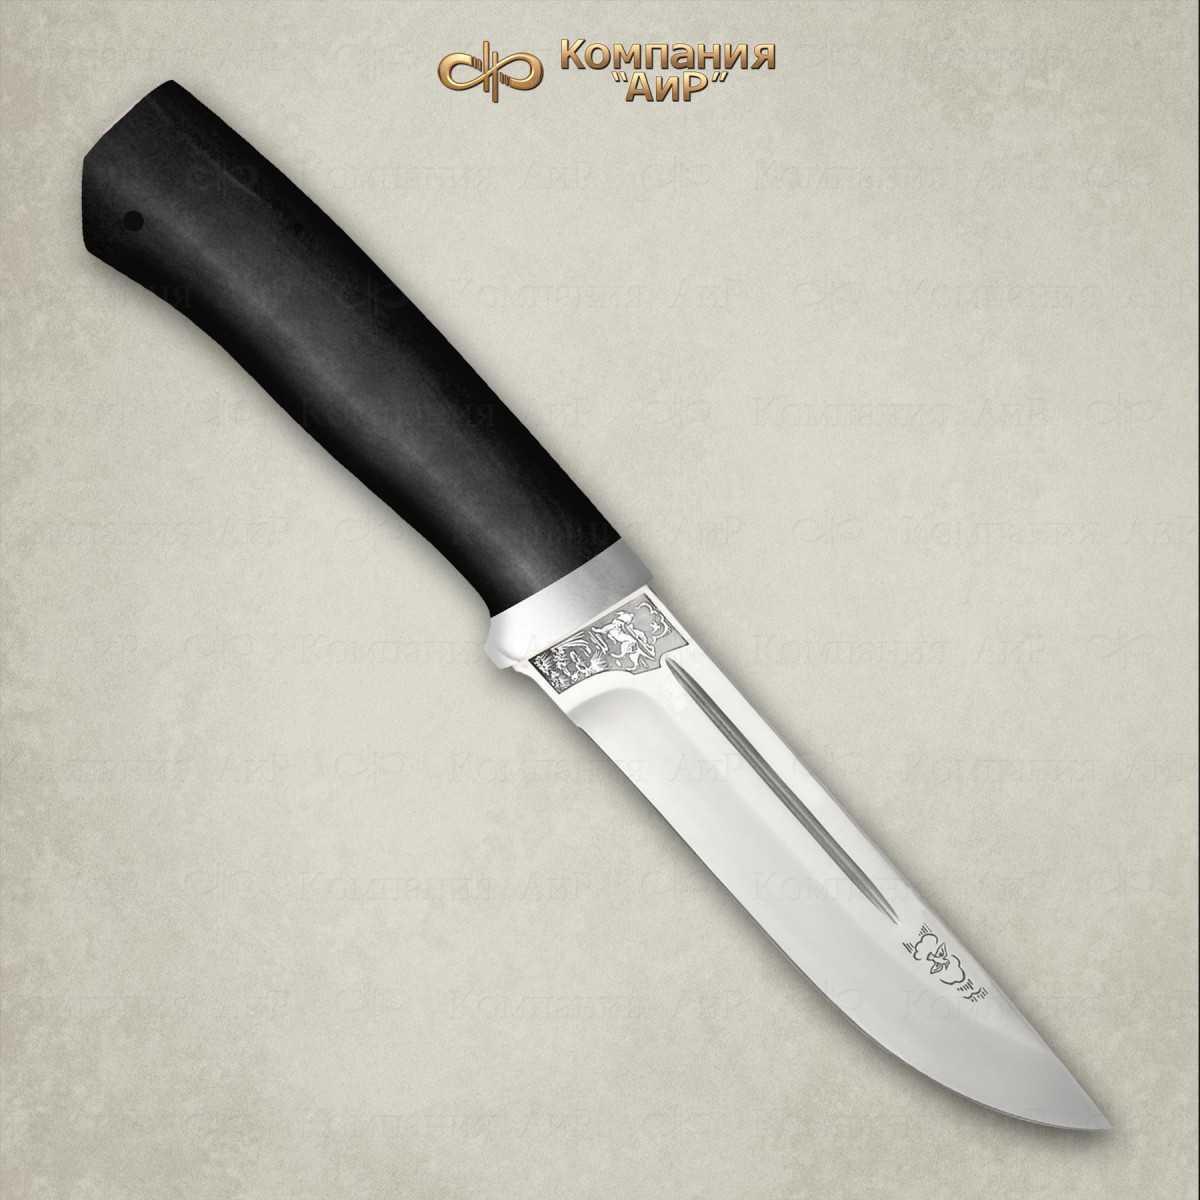 Нож Бекас, сталь M390, граб, АиР